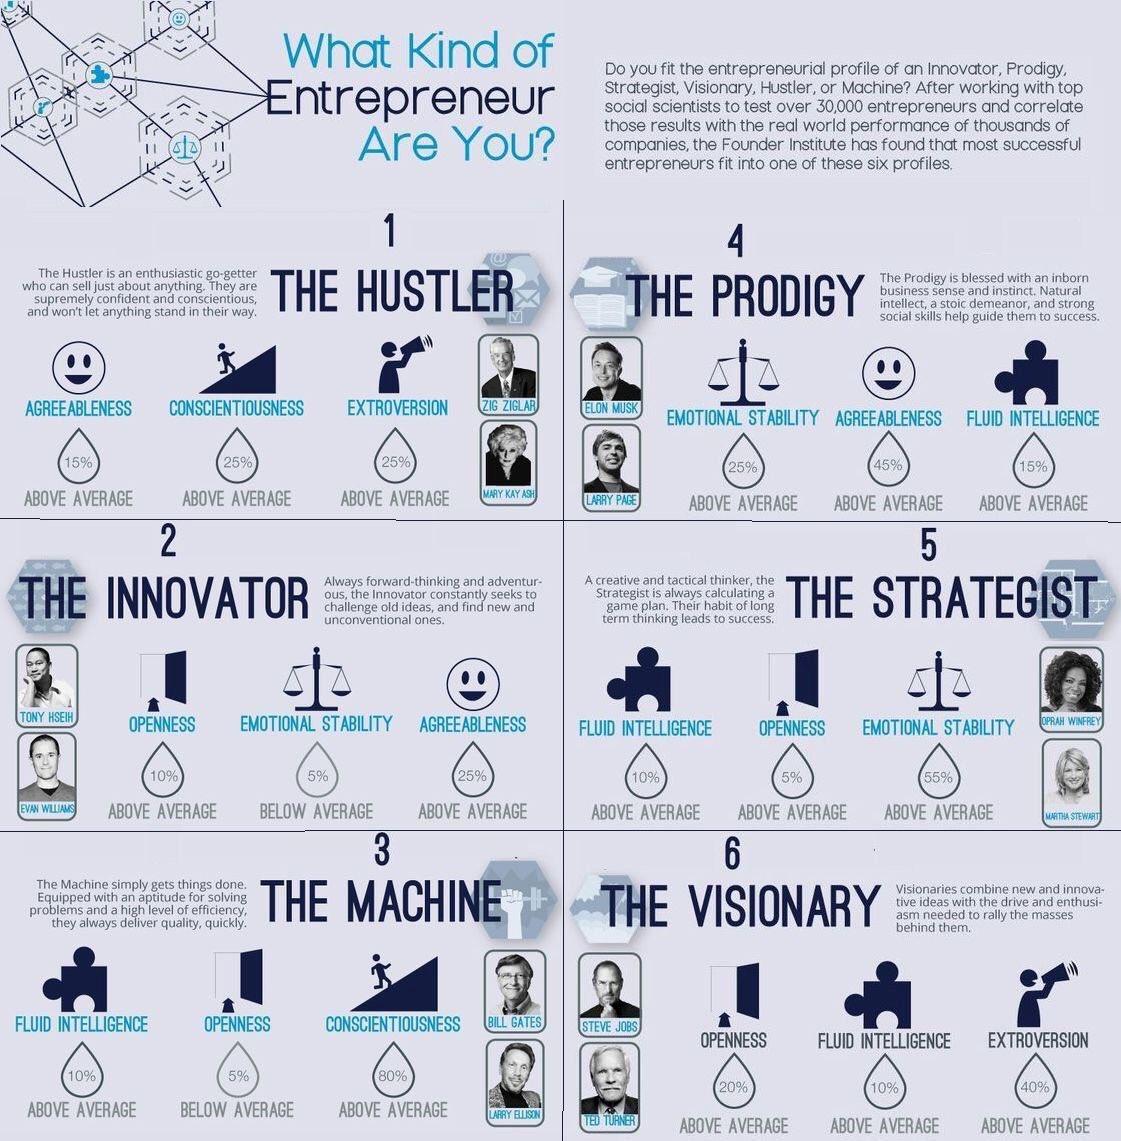 What kind of #Entrepreneur are you?  #Startup #Defstar5 #Innovation #Leadership #makeyourownlane #Mpgvip #SocialMedia #SMM #SEO #BigData #AI<br>http://pic.twitter.com/SfVTXRcn0Q